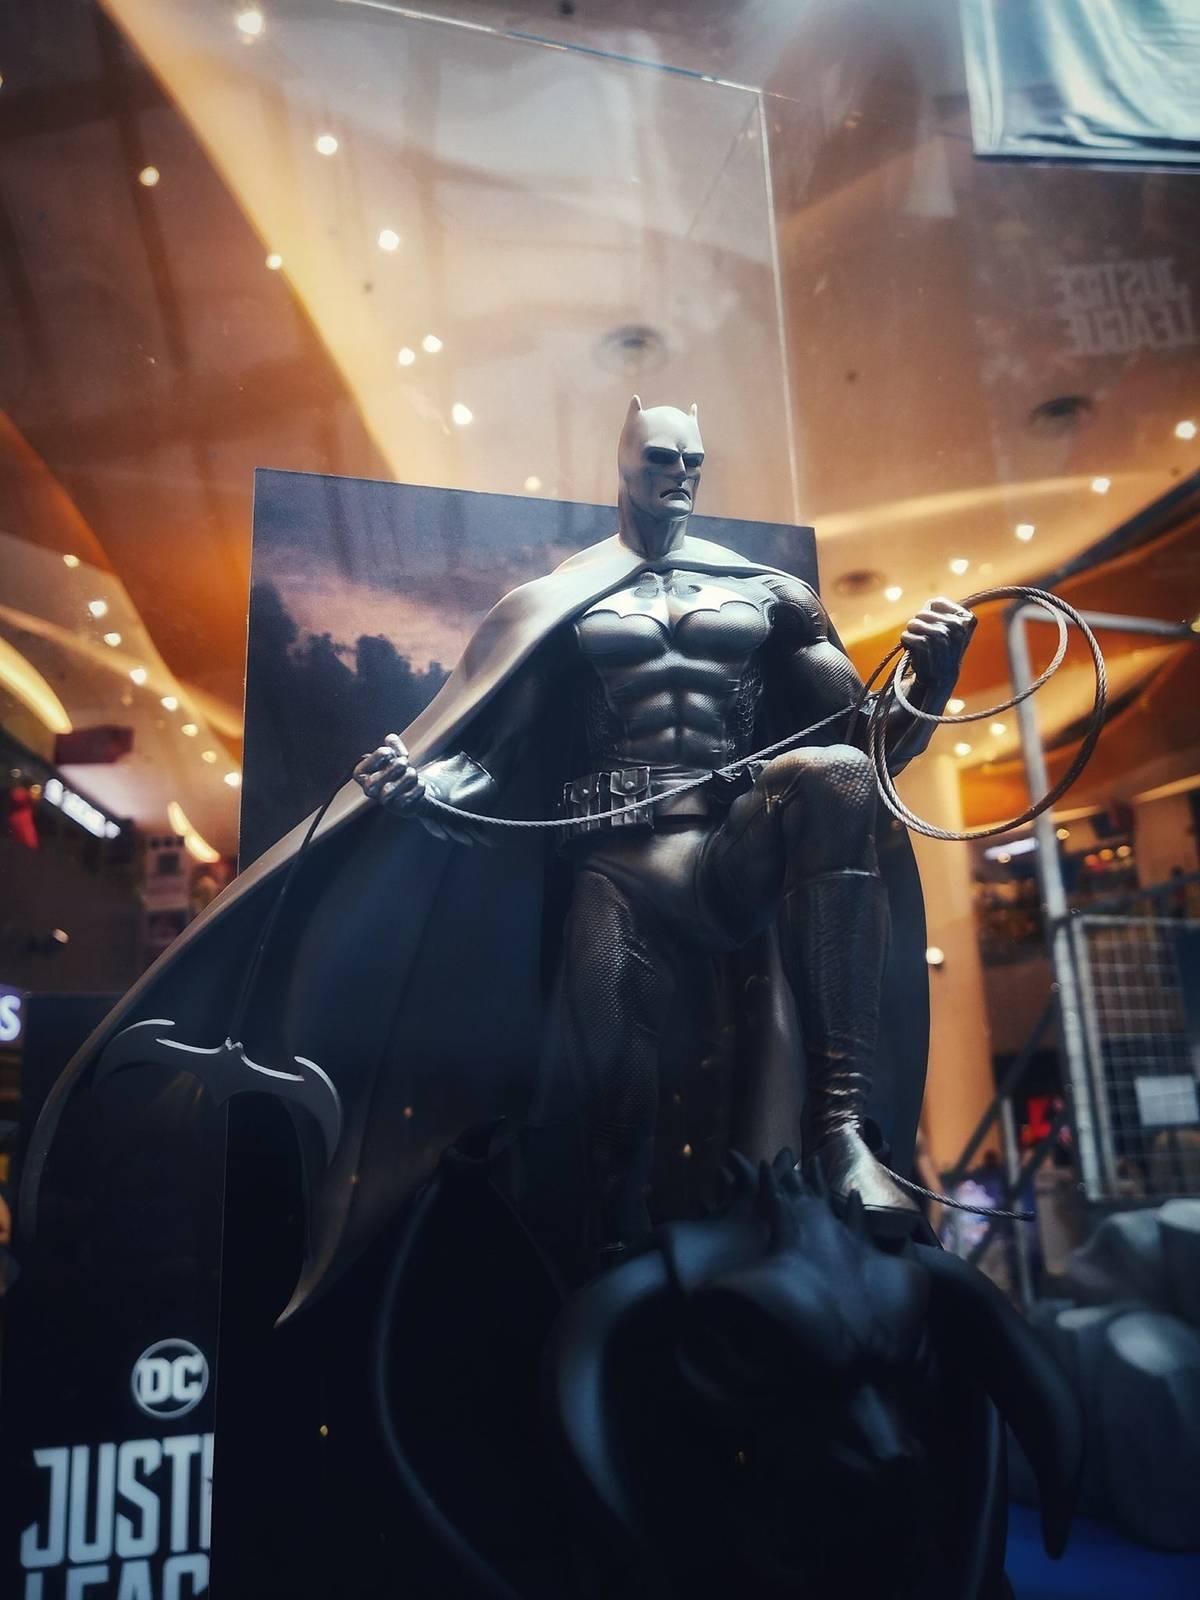 Limited Edition Batman by Royal Selangor